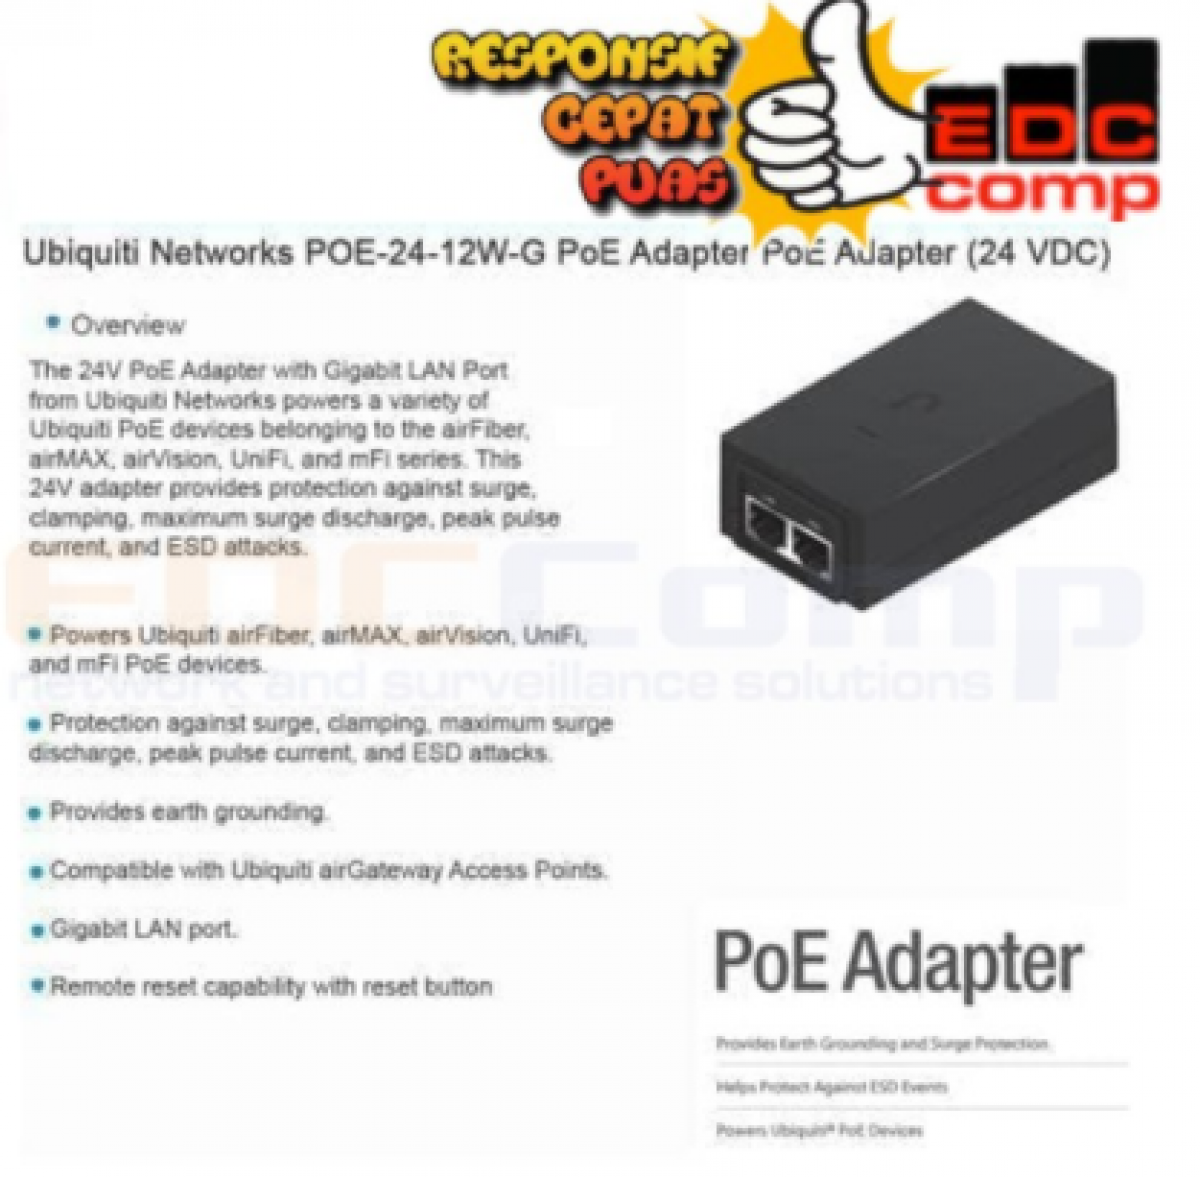 UBNT POE-24-12W-G - UBNT Gigabit POE 24V 0.5A - EdcComp